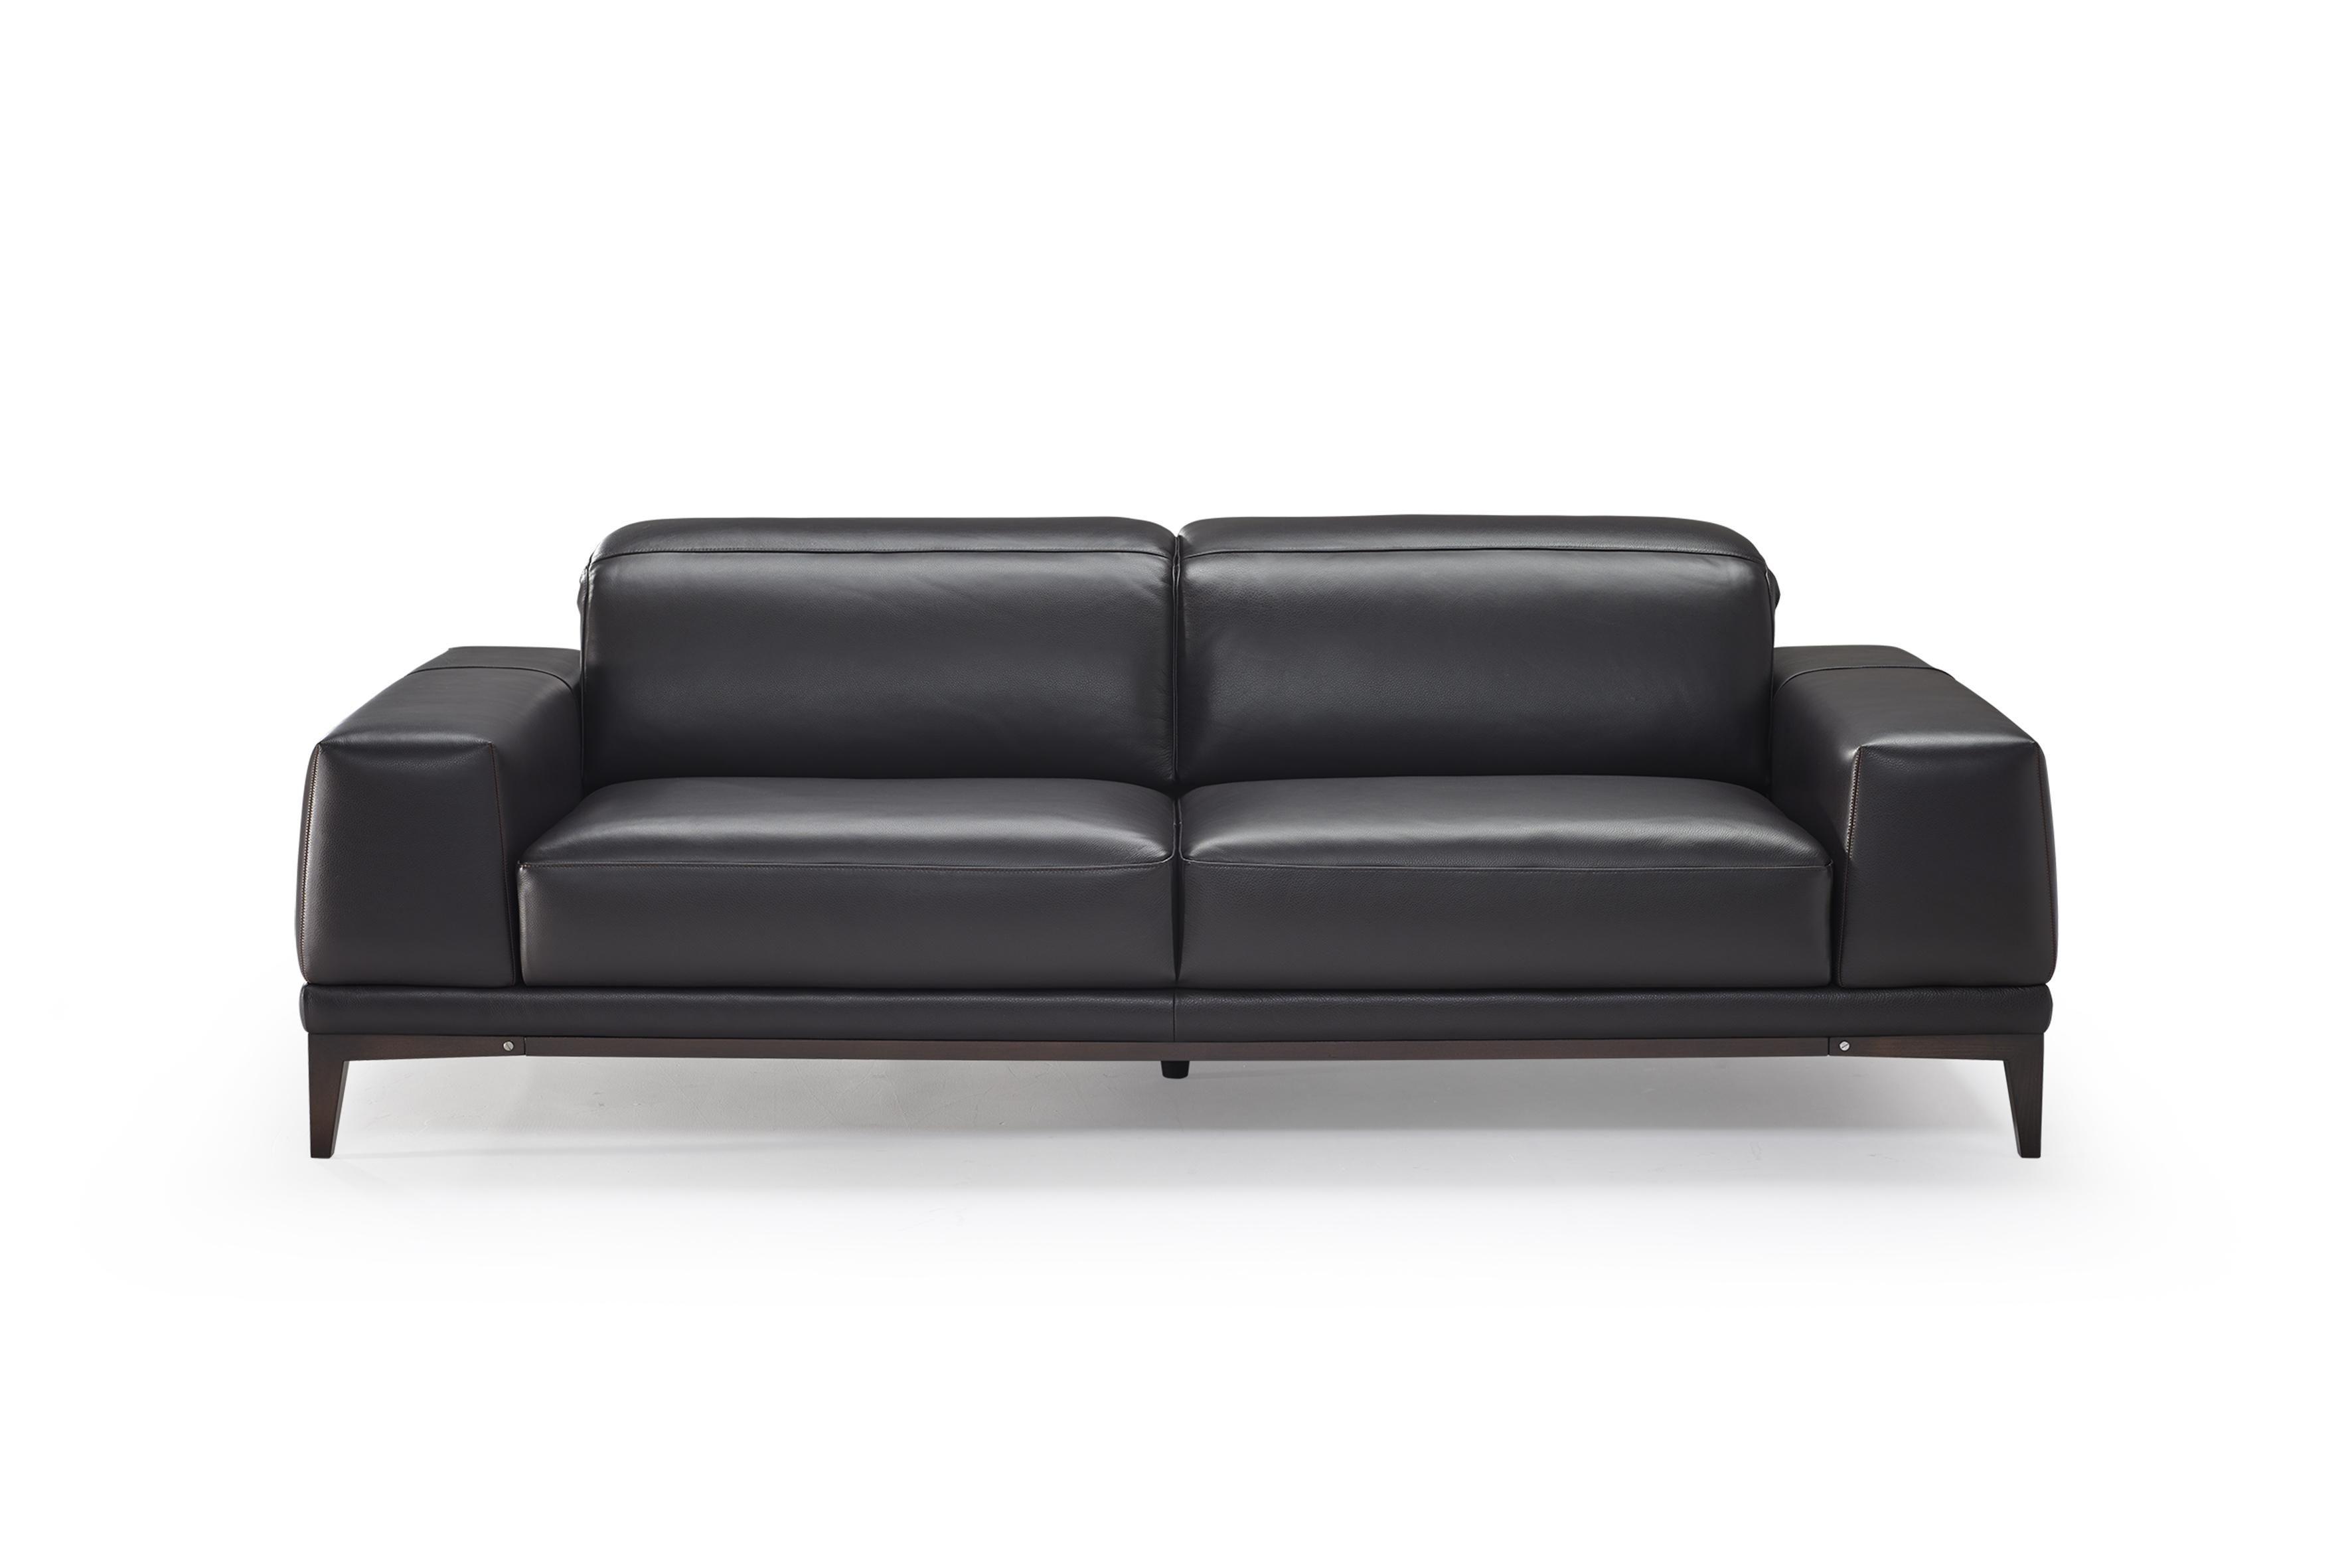 Borghese is a sophisticated designer sofa boasting soft shapes